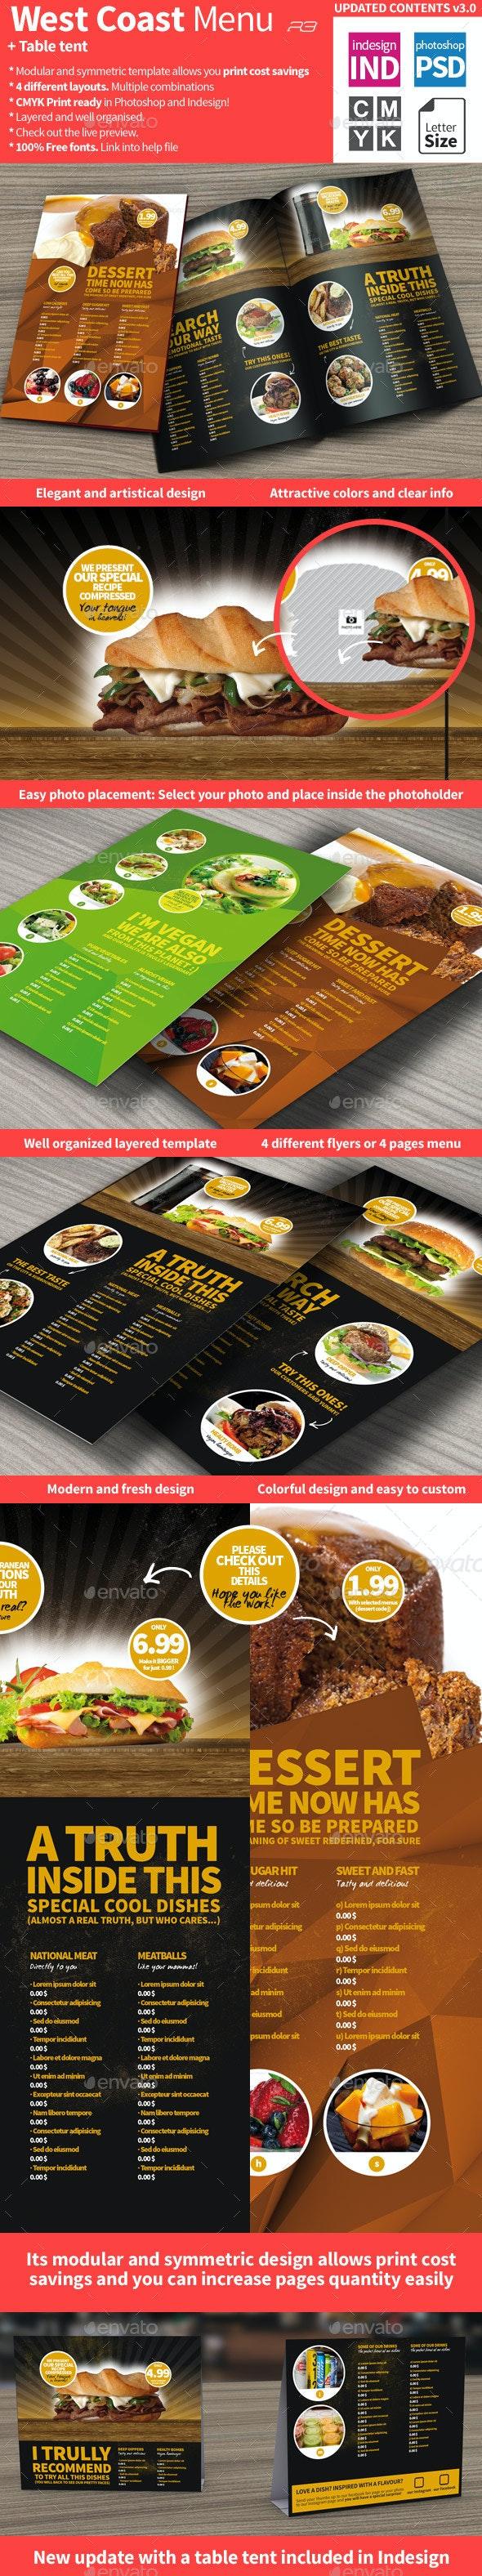 West Coast Menu Template - Food Menus Print Templates